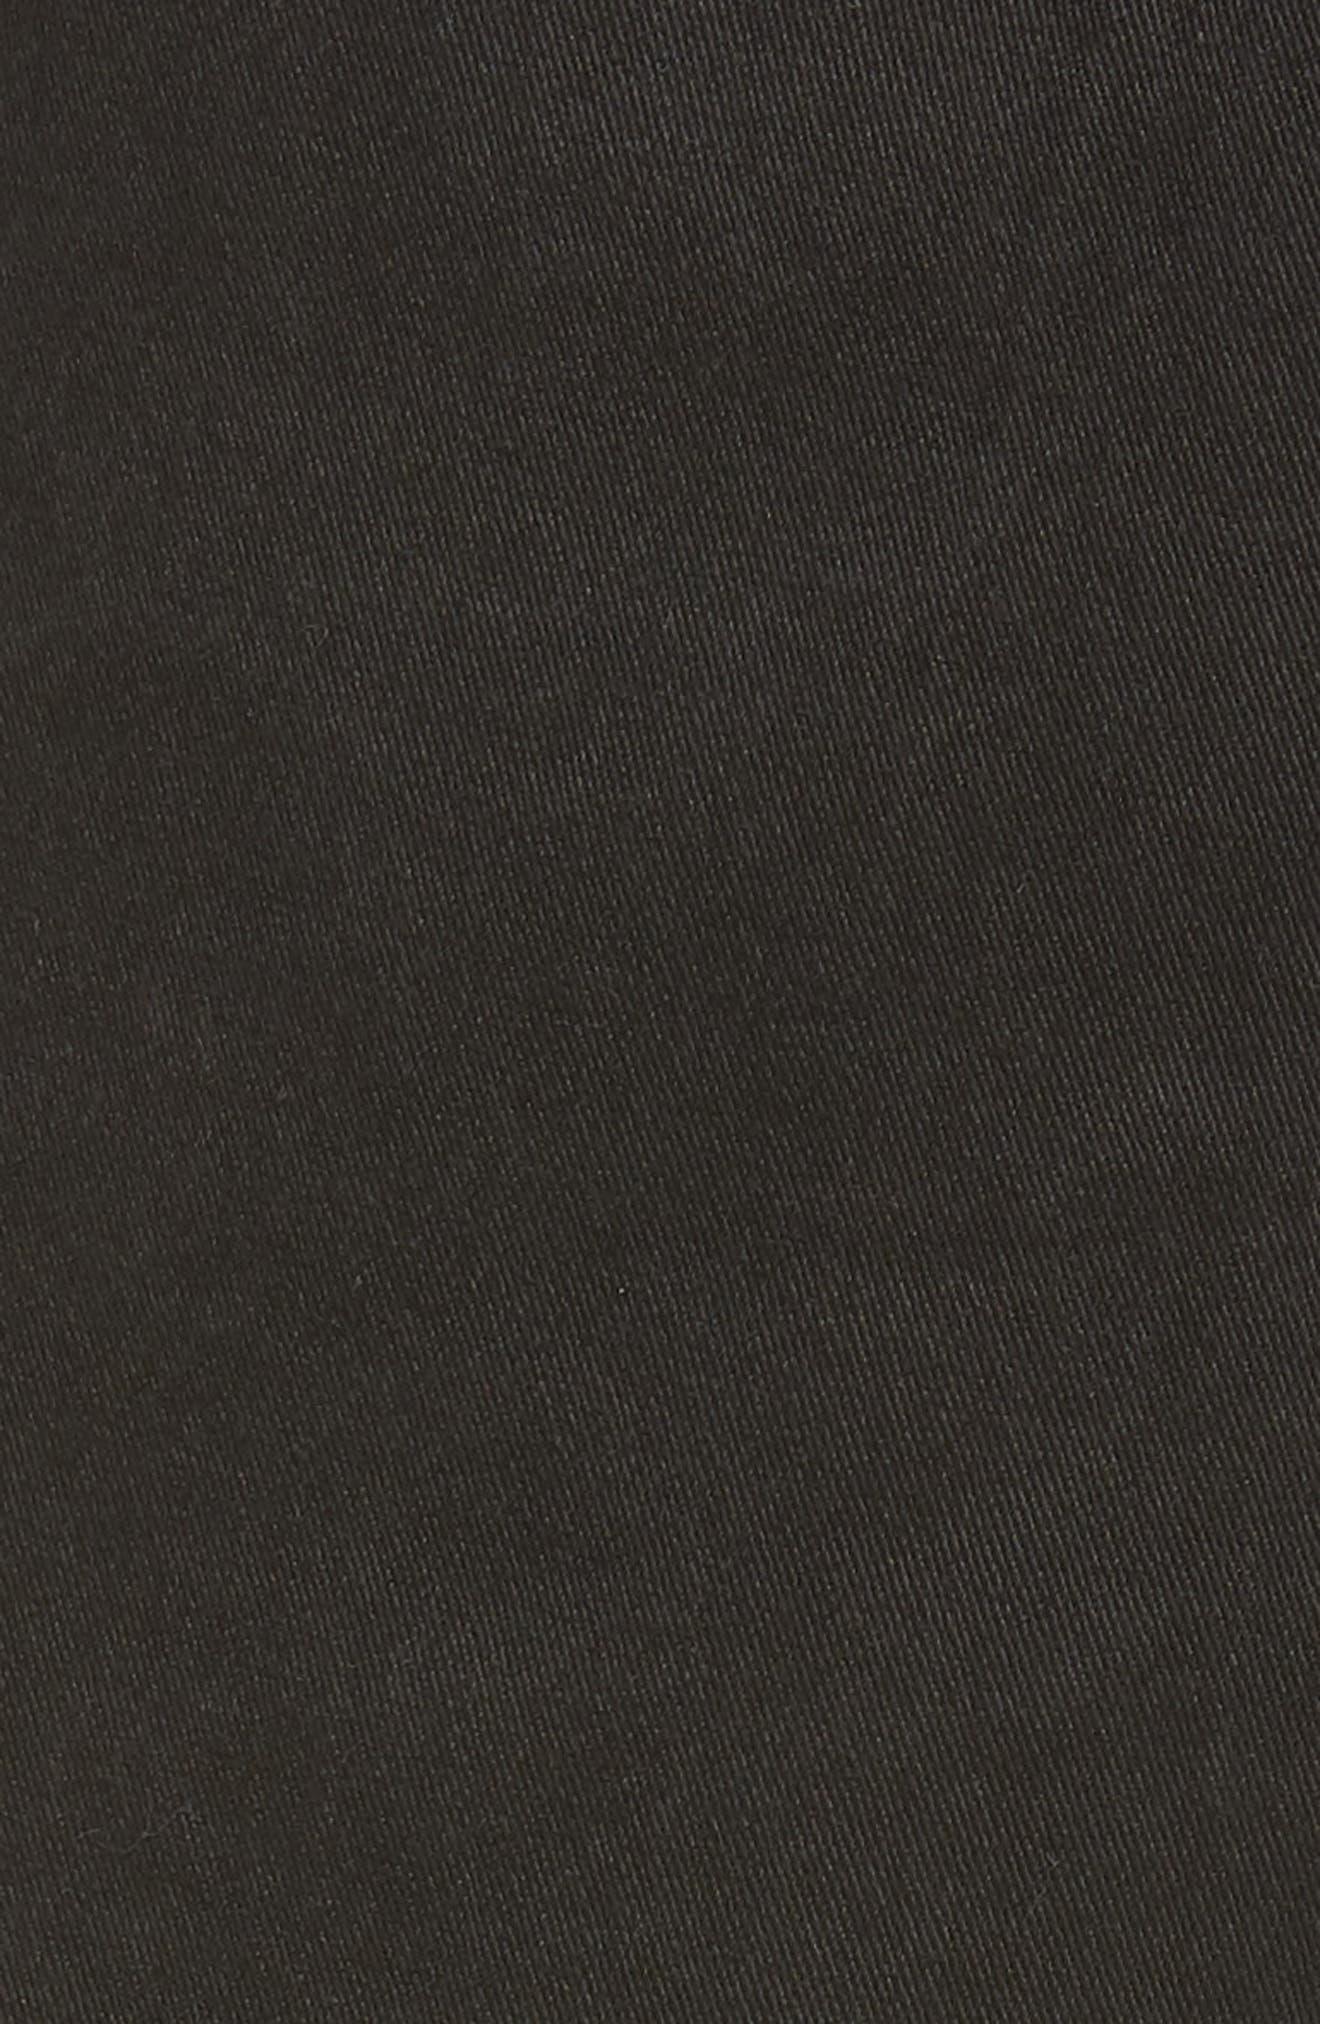 Pigment Dye Volley Shorts,                             Alternate thumbnail 5, color,                             Grey Onyx